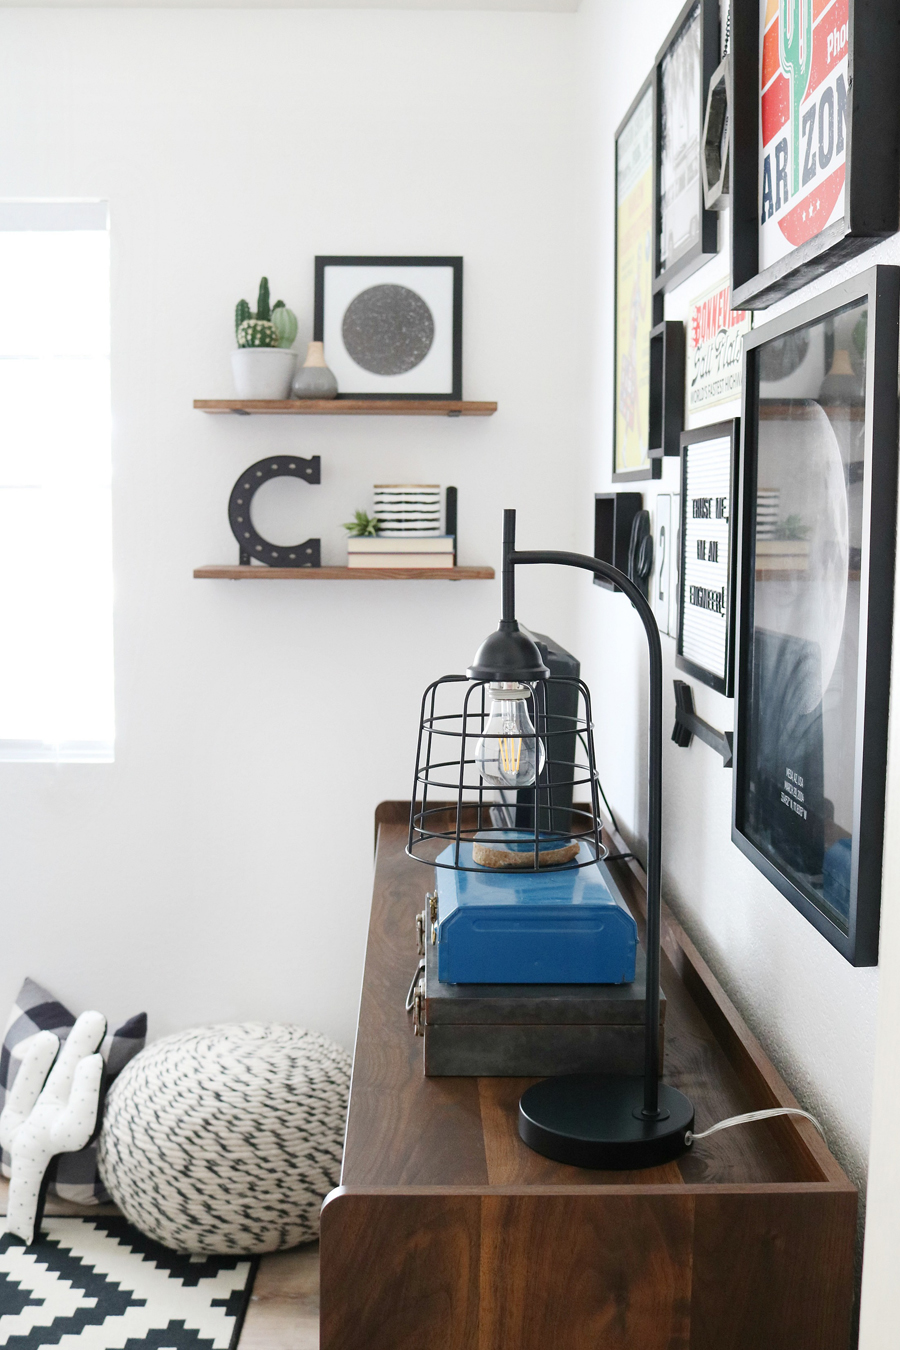 Teen Boy's Room Decor - Wall Shelves